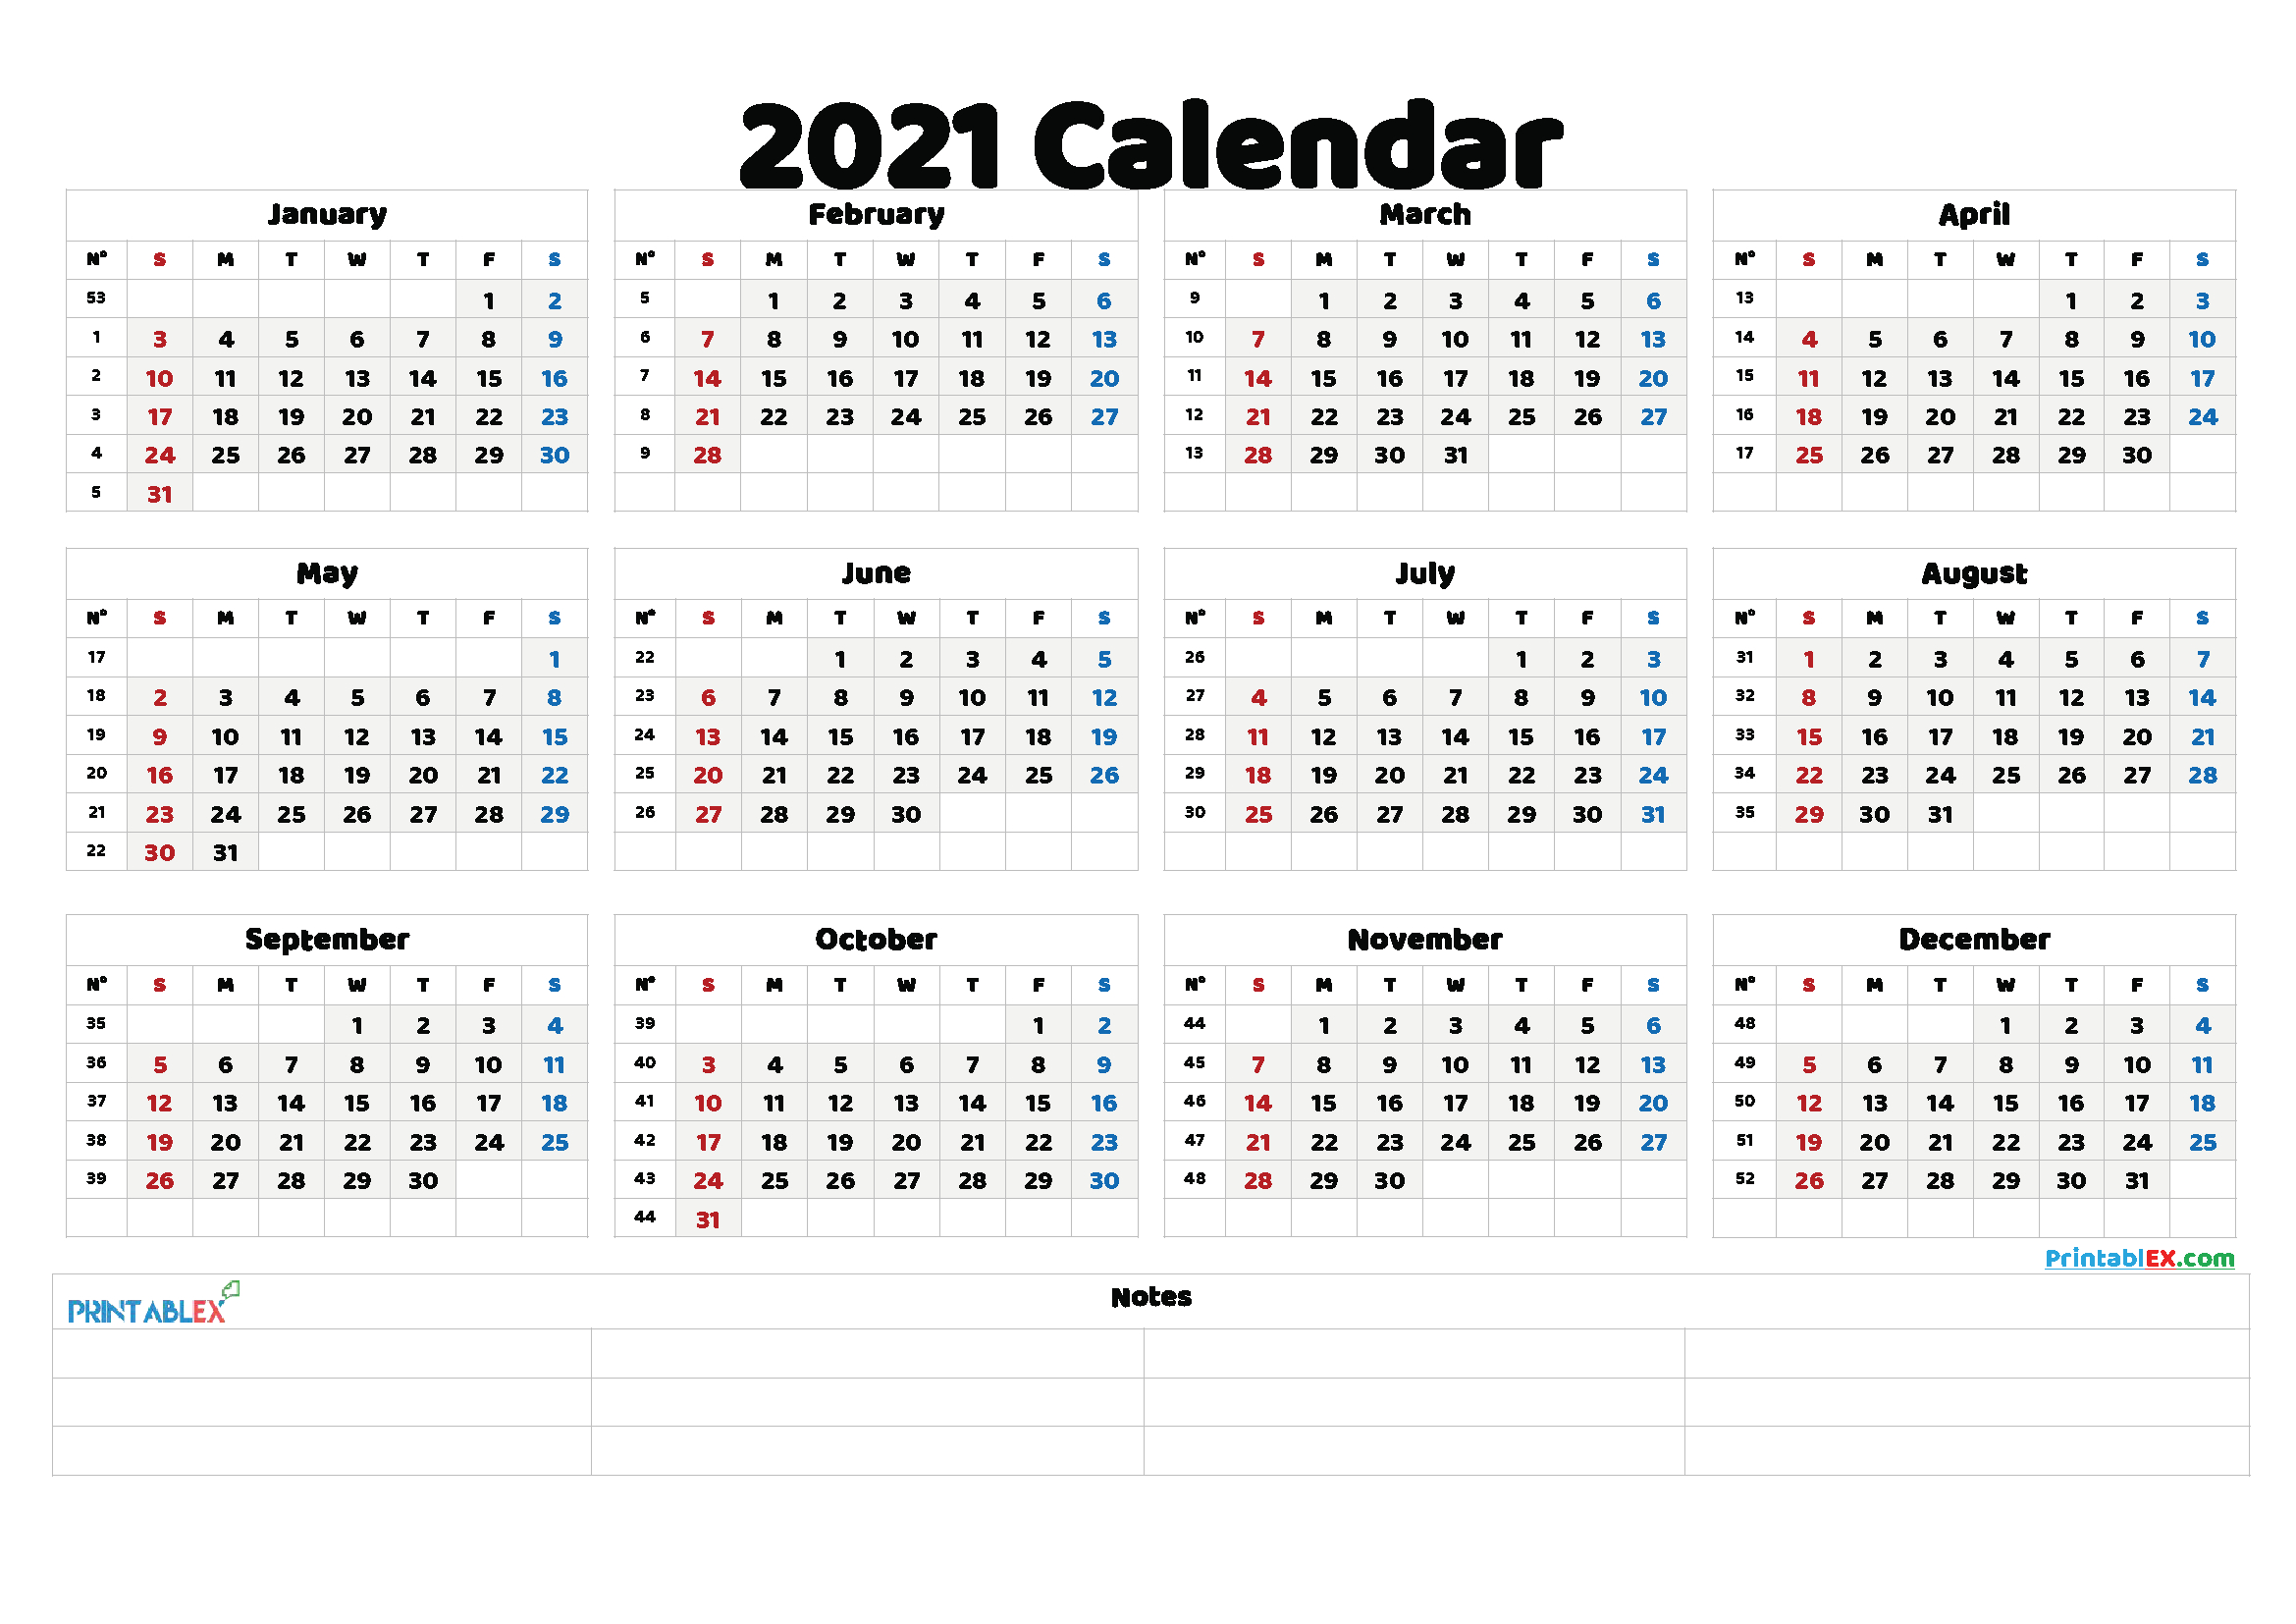 Free Editable Weekly 2021 Calendar : Custom Editable 2021 Online Calander I Can Edit